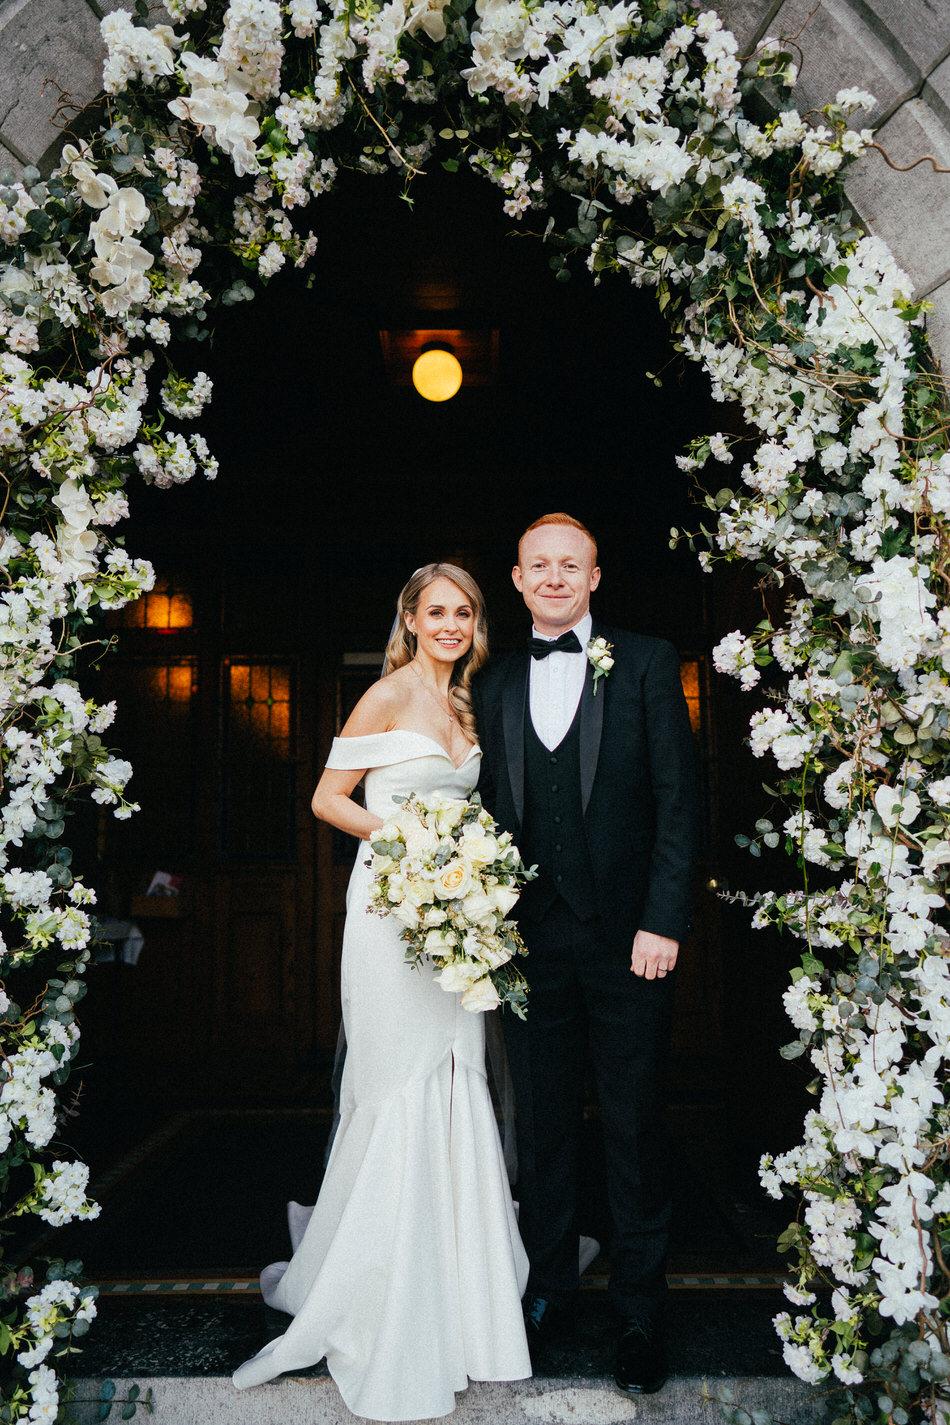 Castle-wedding-ireland-photos- 0150 102